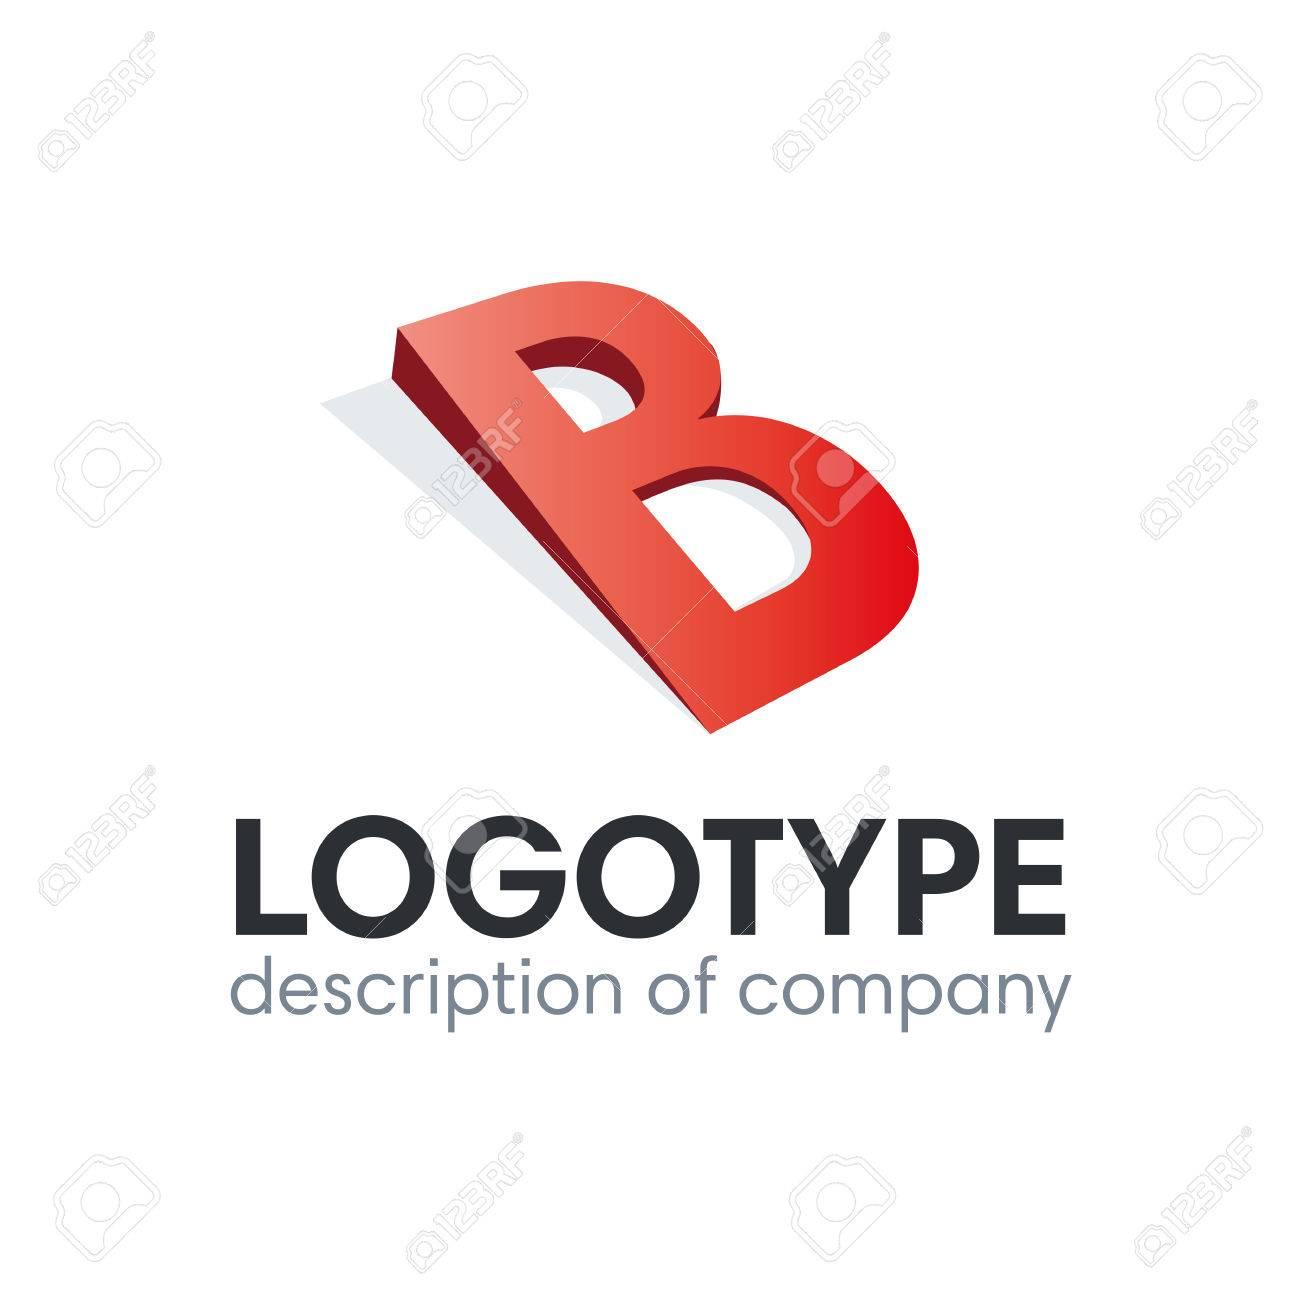 Letter B logo icon design template elements - 84037591